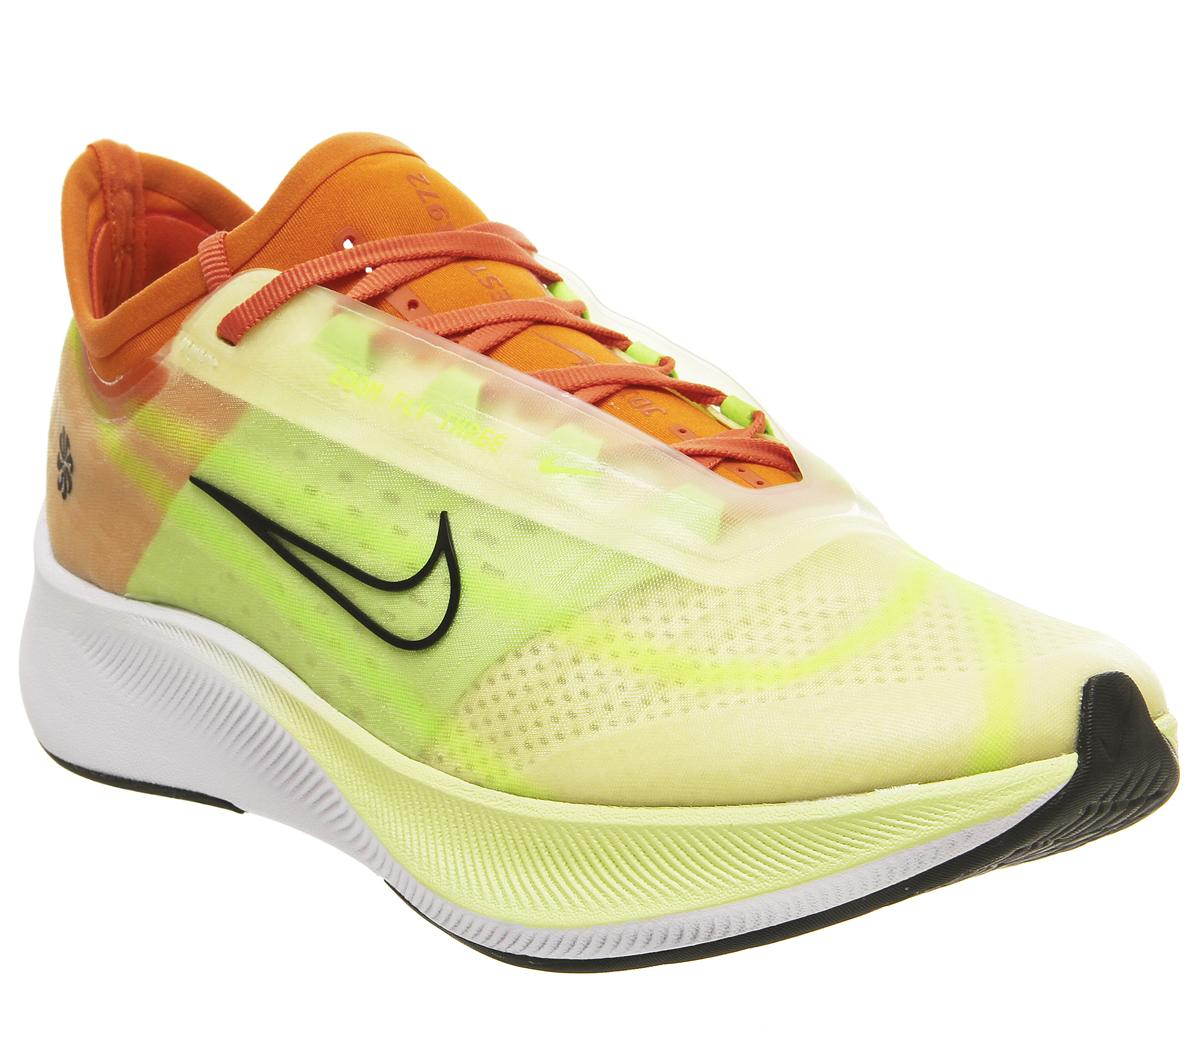 Destino Mareo agujero  Nike Zoom Fly 3 Luminous Green Black Starfish - Unisex Sports